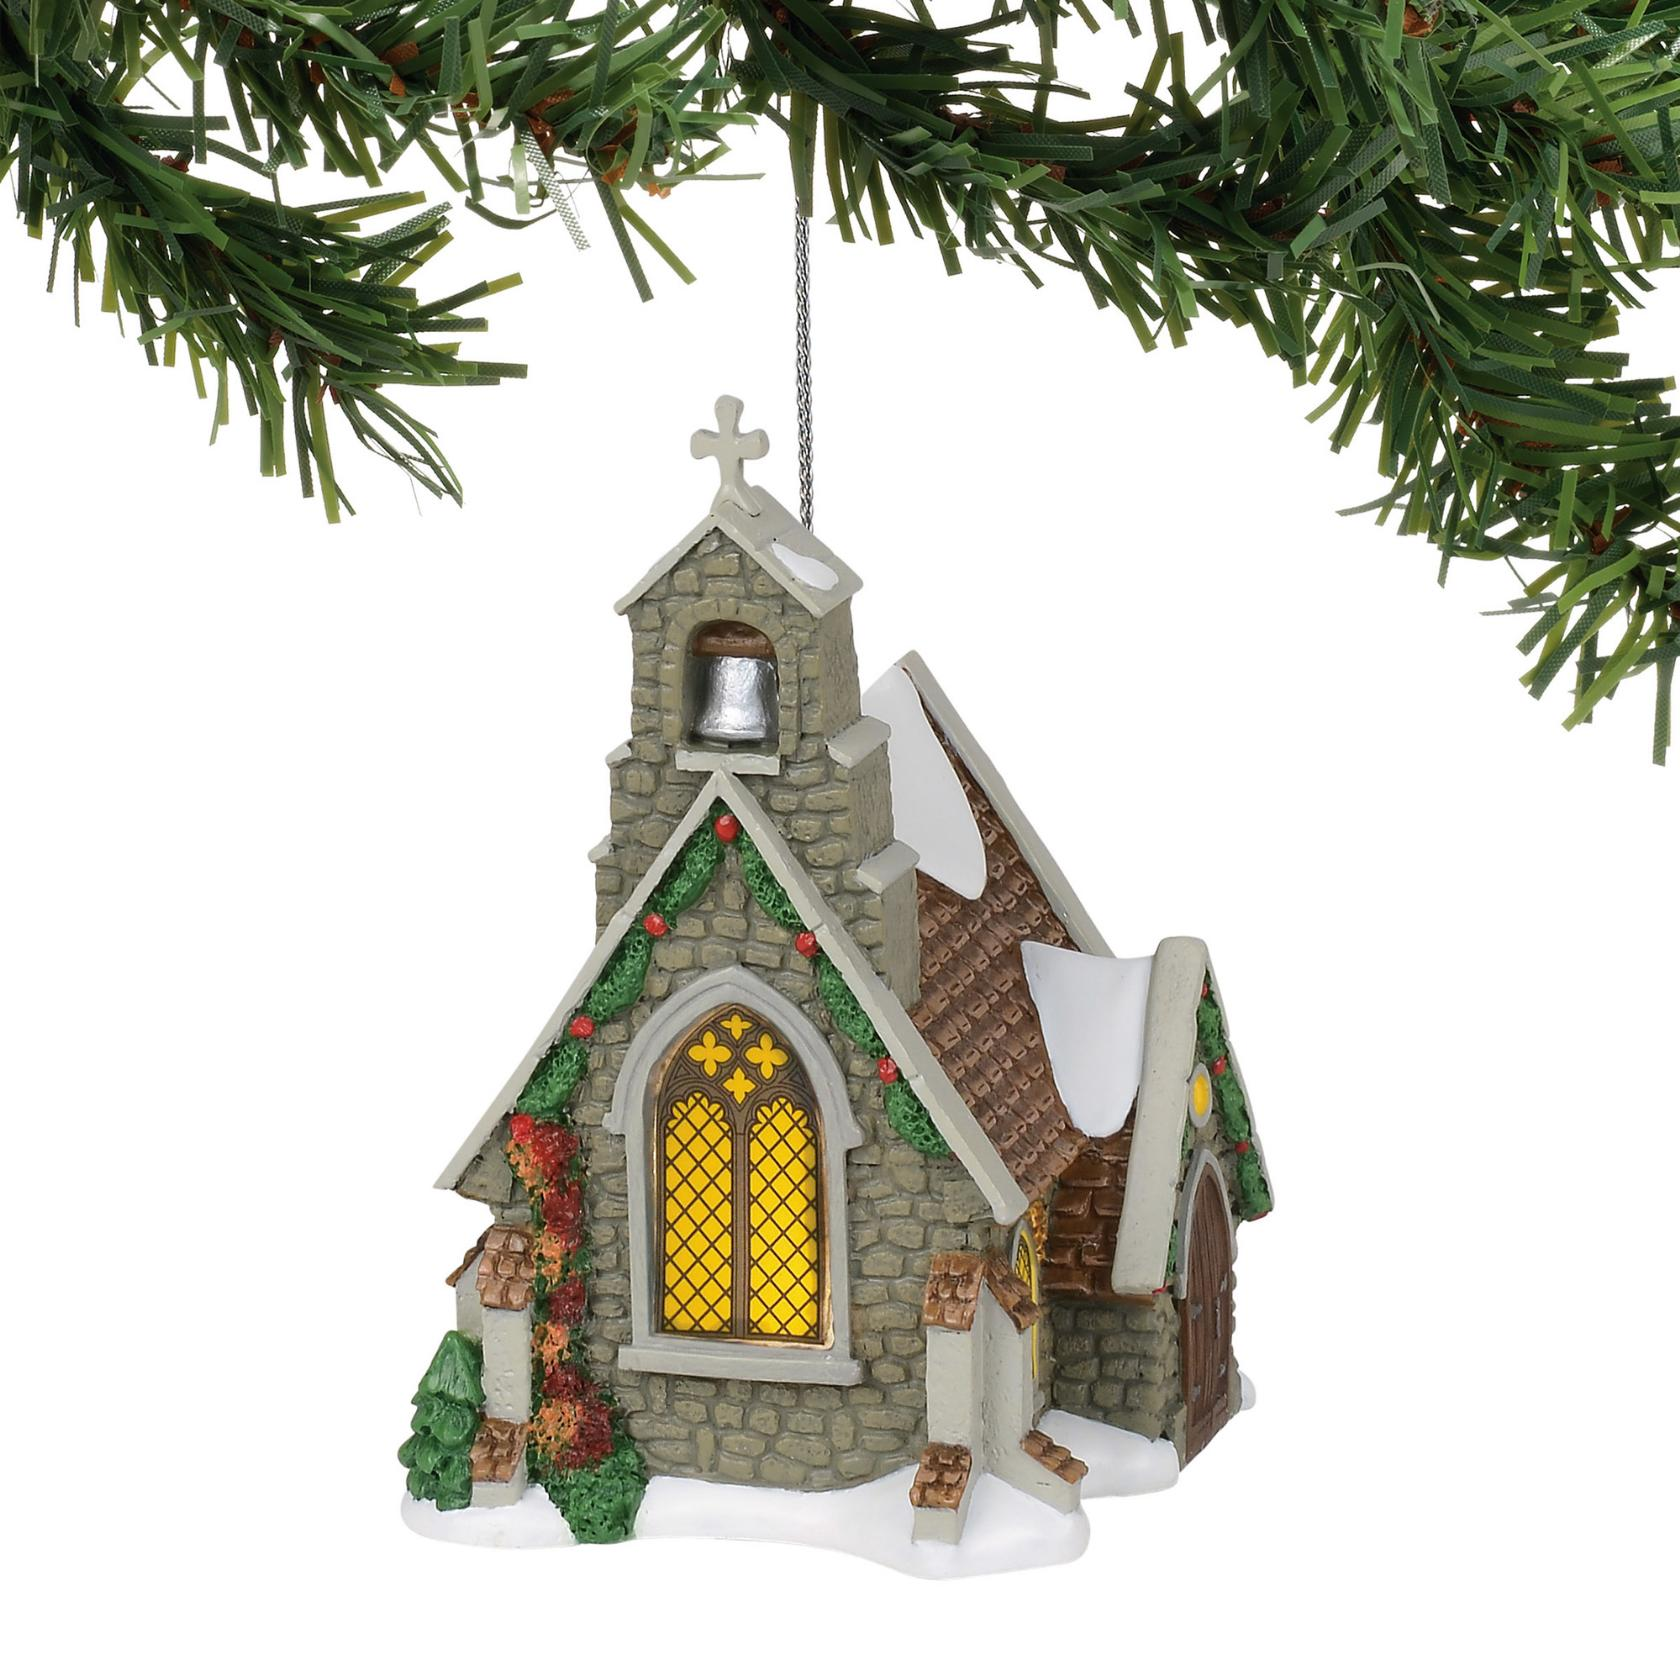 Isle of Wight Chapel Ornament